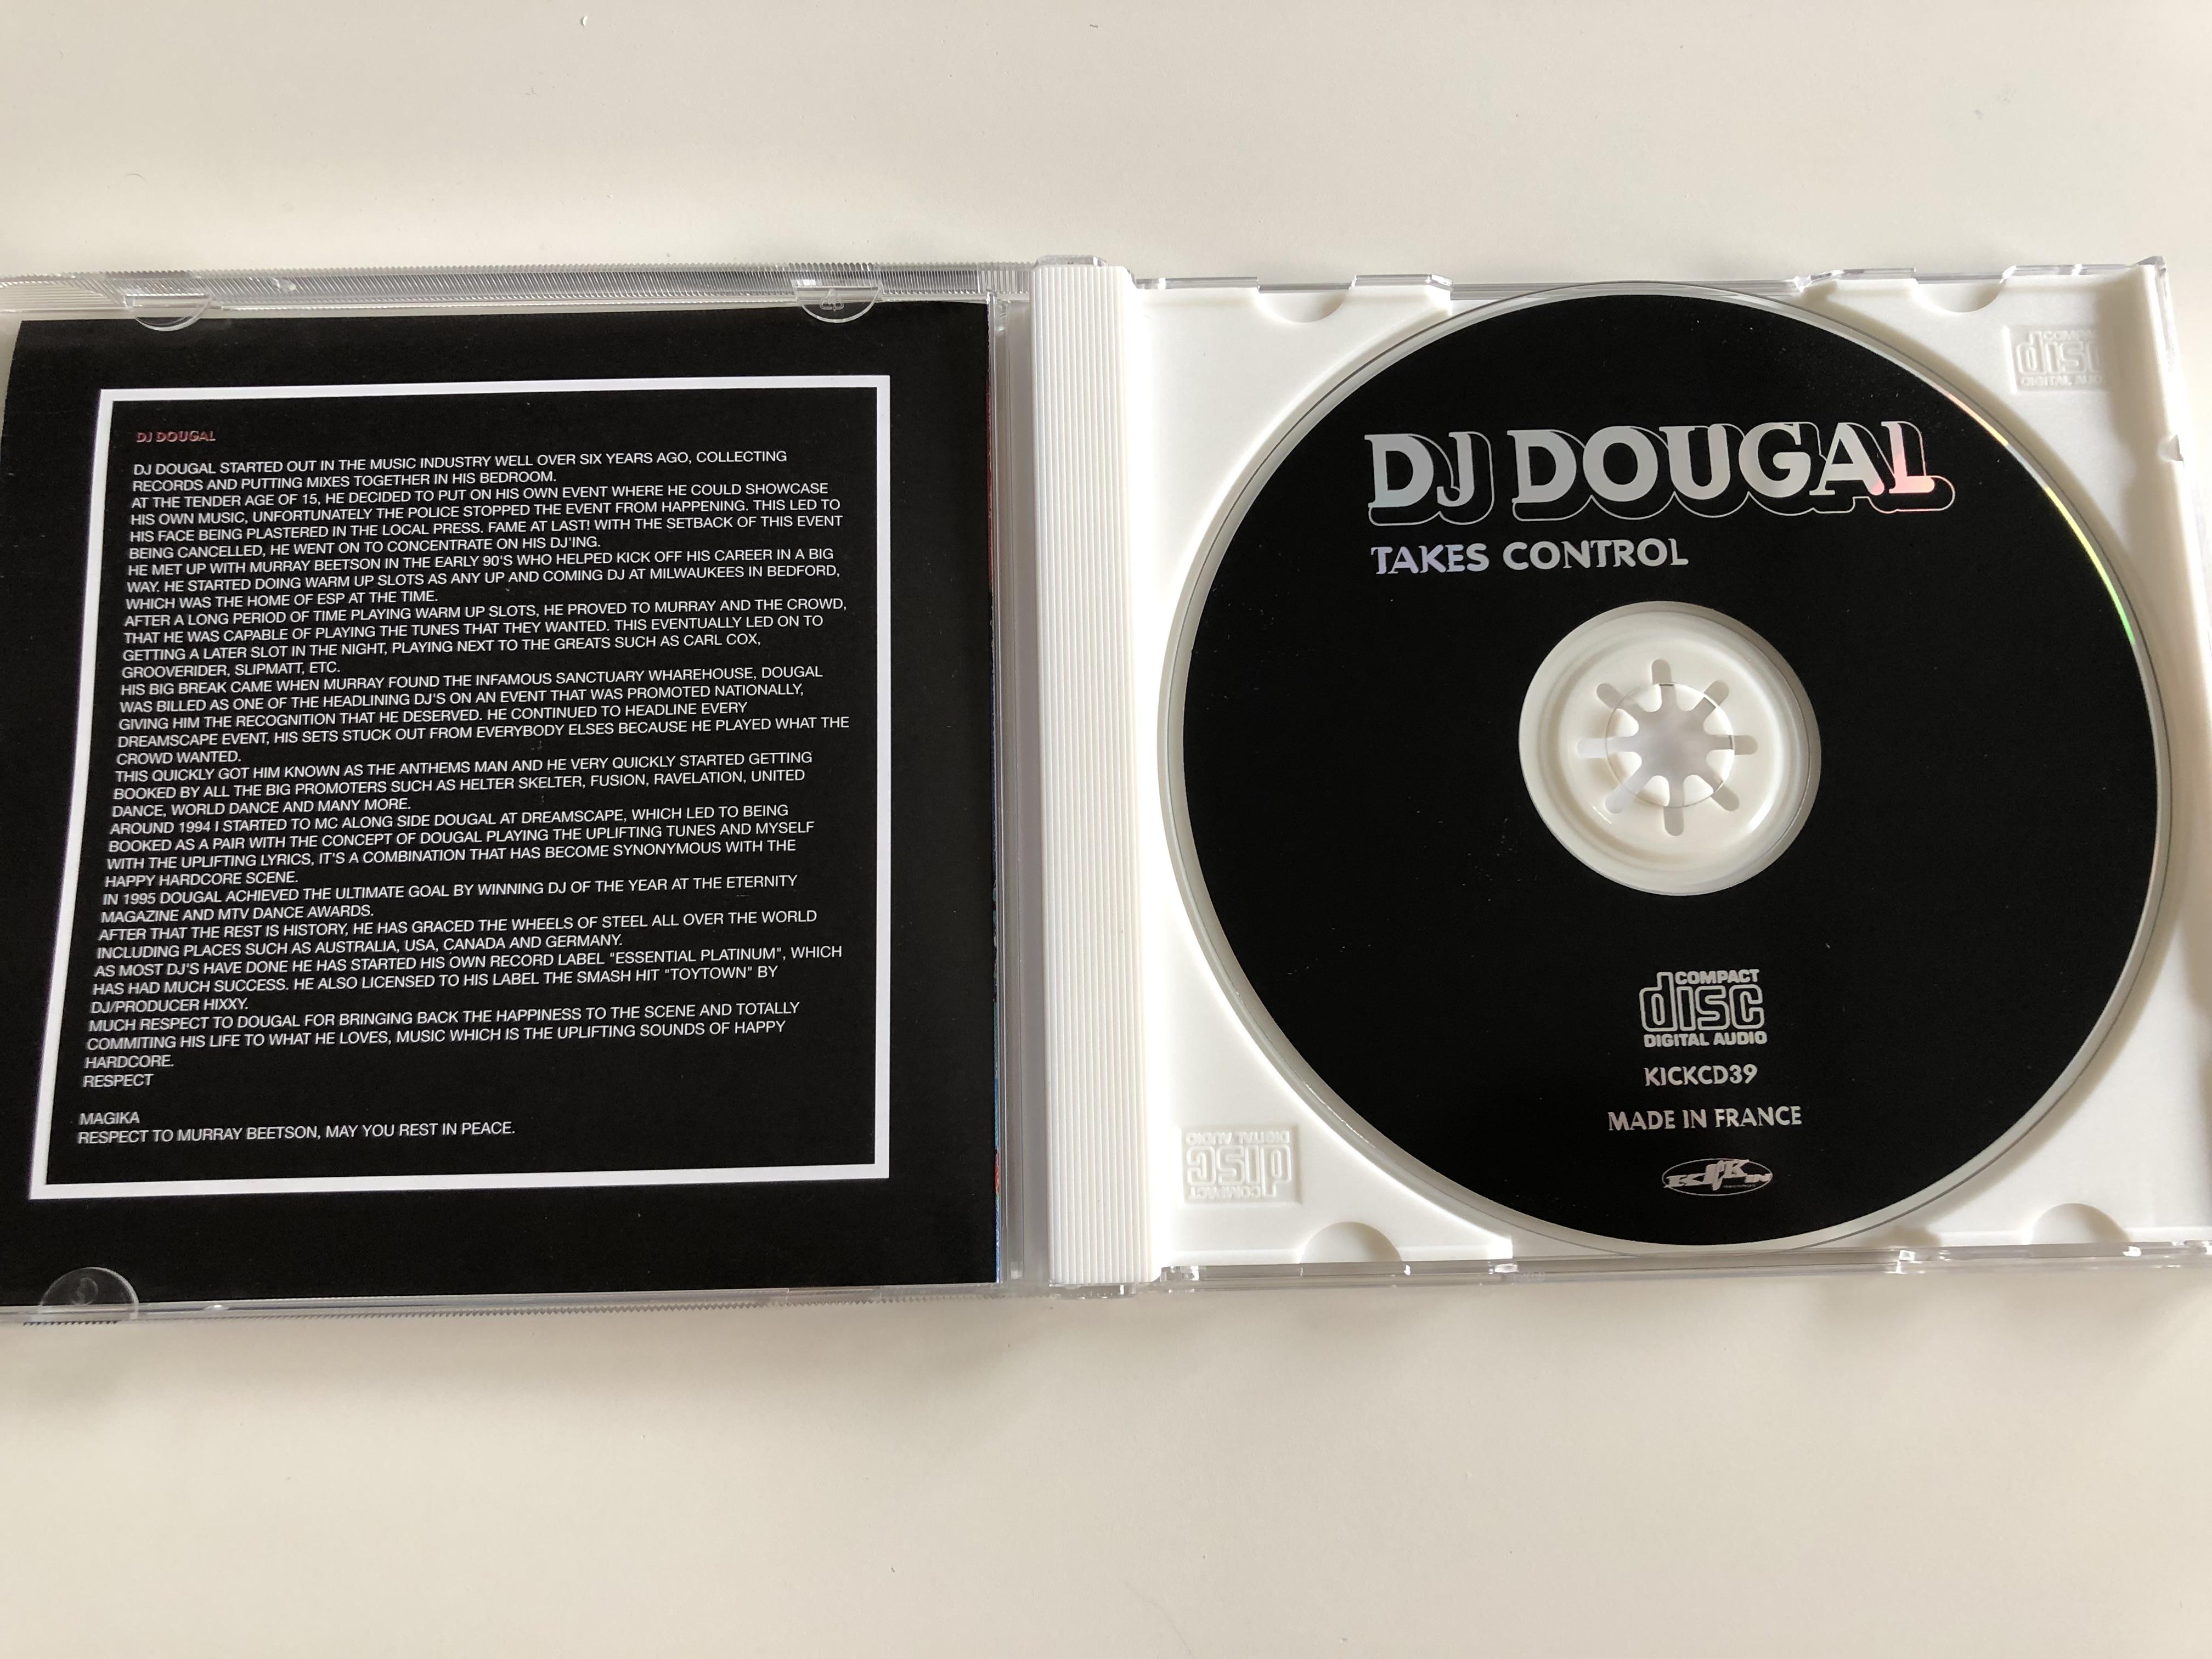 dj-dougal-takes-control-eruption-dougal-skeedale-dj-ham-ramos-supreme-hopscotch-audio-cd-1996-kikcd39-3-.jpg